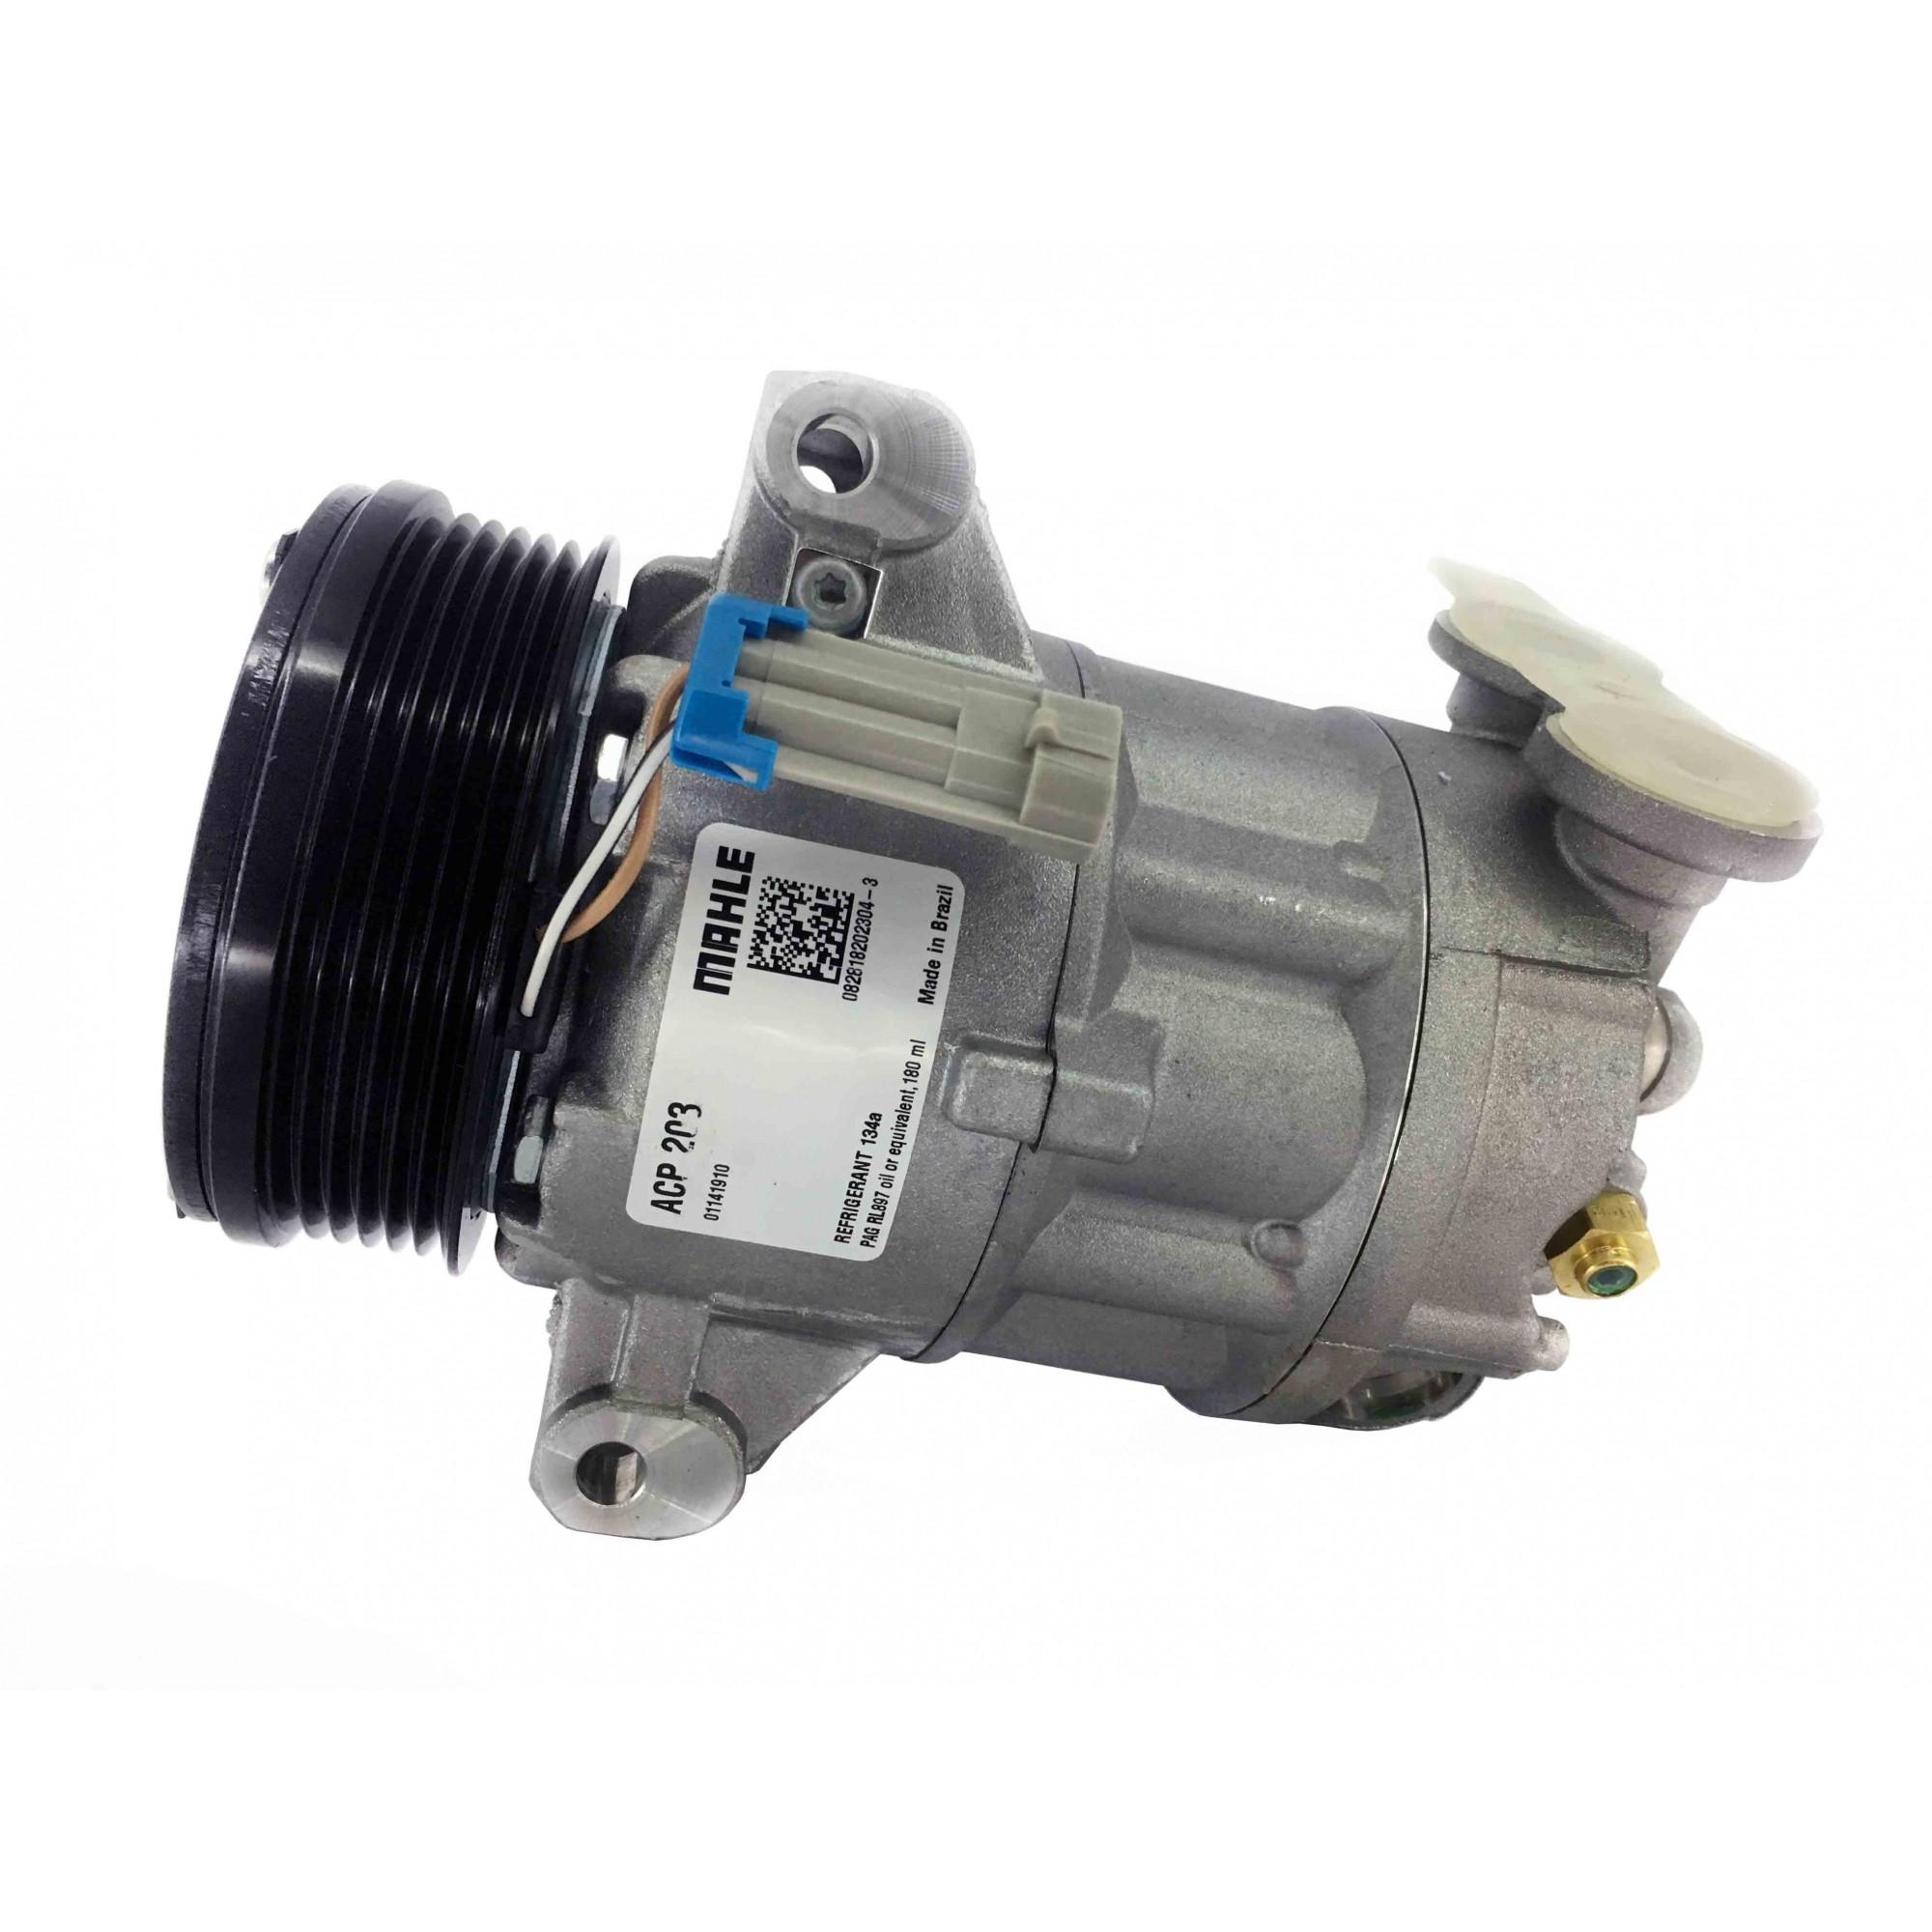 Compressor S10 2.4 Gas 2.8 Diesel - Original MAHLE + Brinde